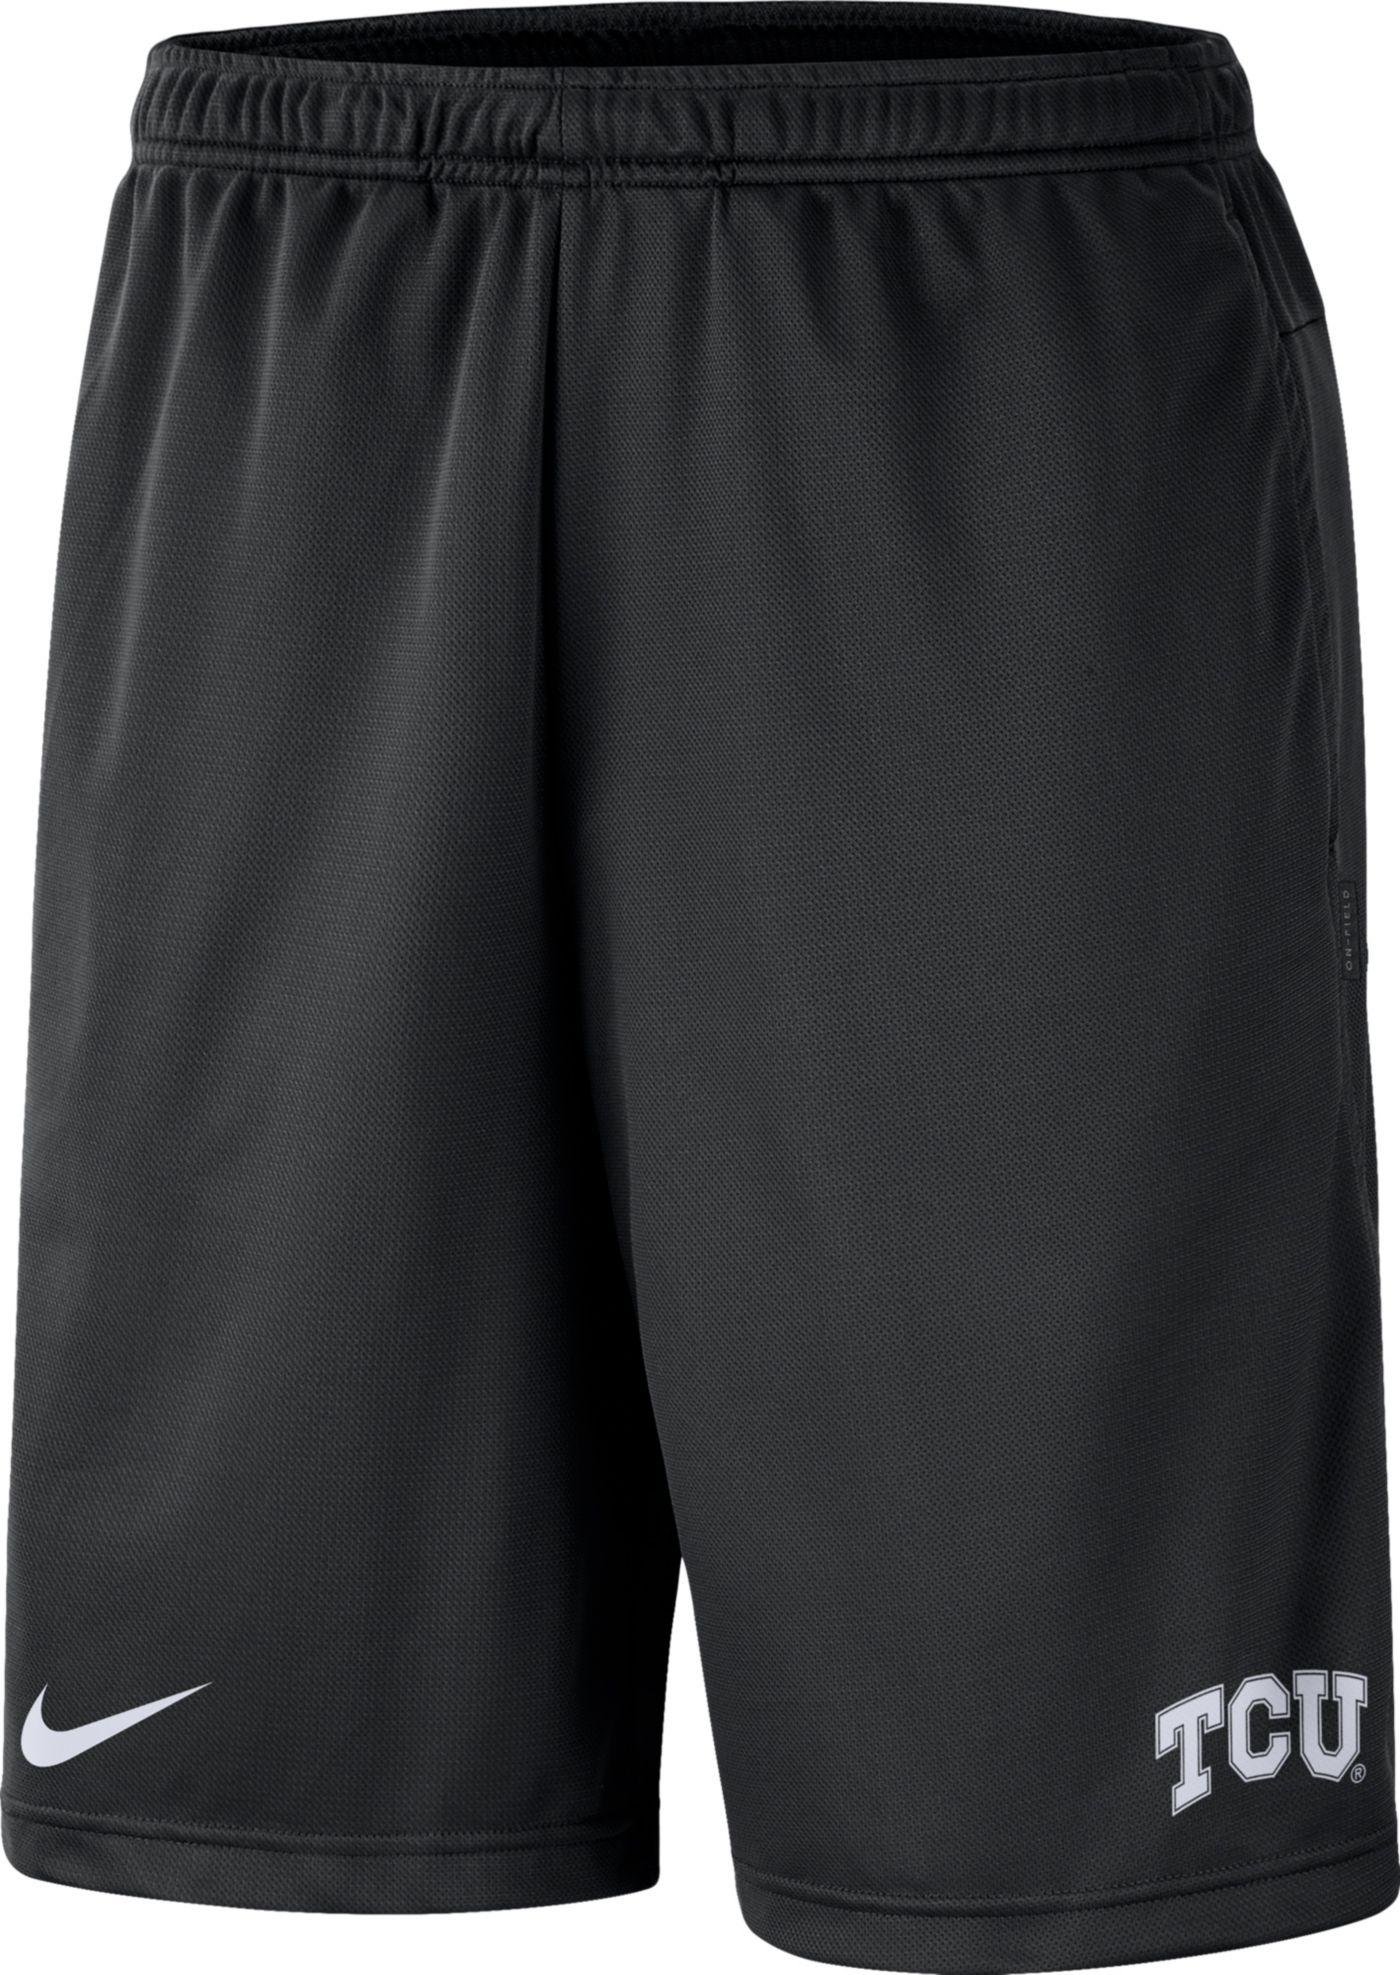 Nike Men's TCU Horned Frogs Dri-FIT Coach Black Shorts